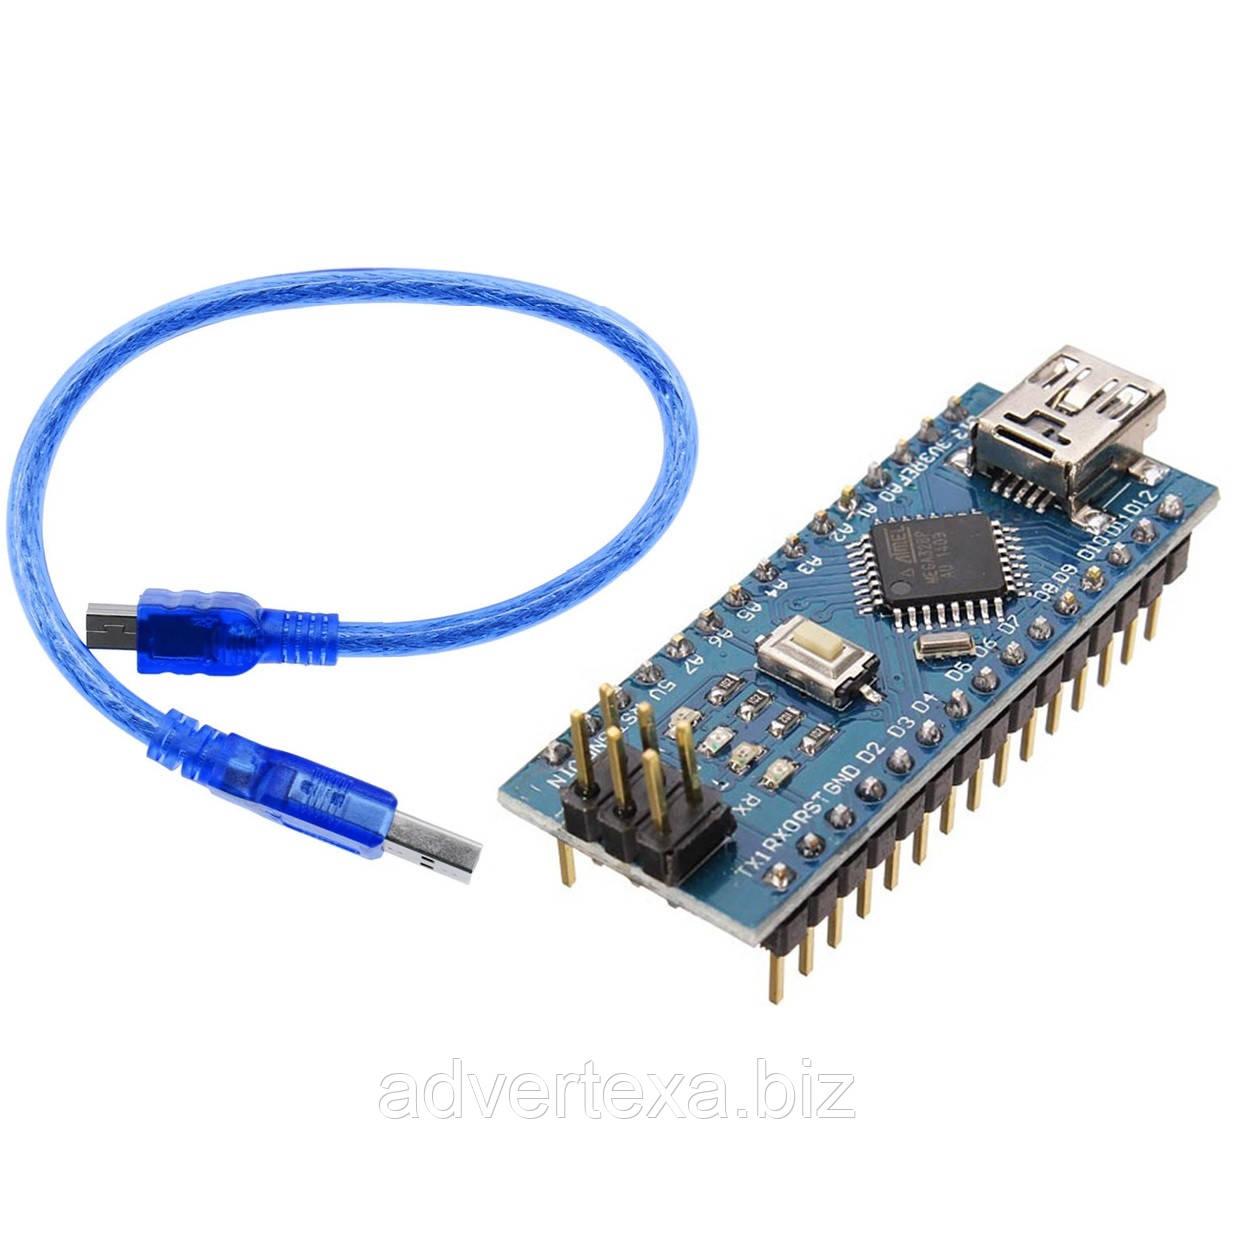 Arduino Nano V3.0 (ATmega328/ch340g - MiniUsb - UART) 5 Ст. 16 мГц. з USB кабелем